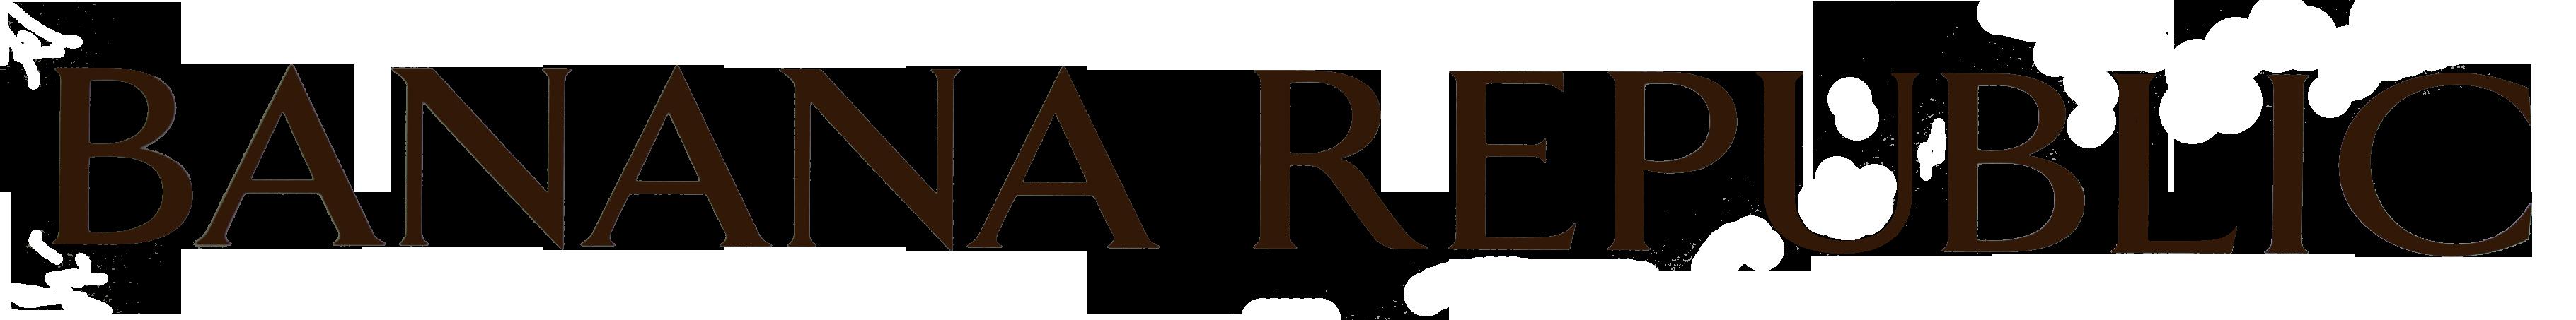 File:Banana Republic logo.png.